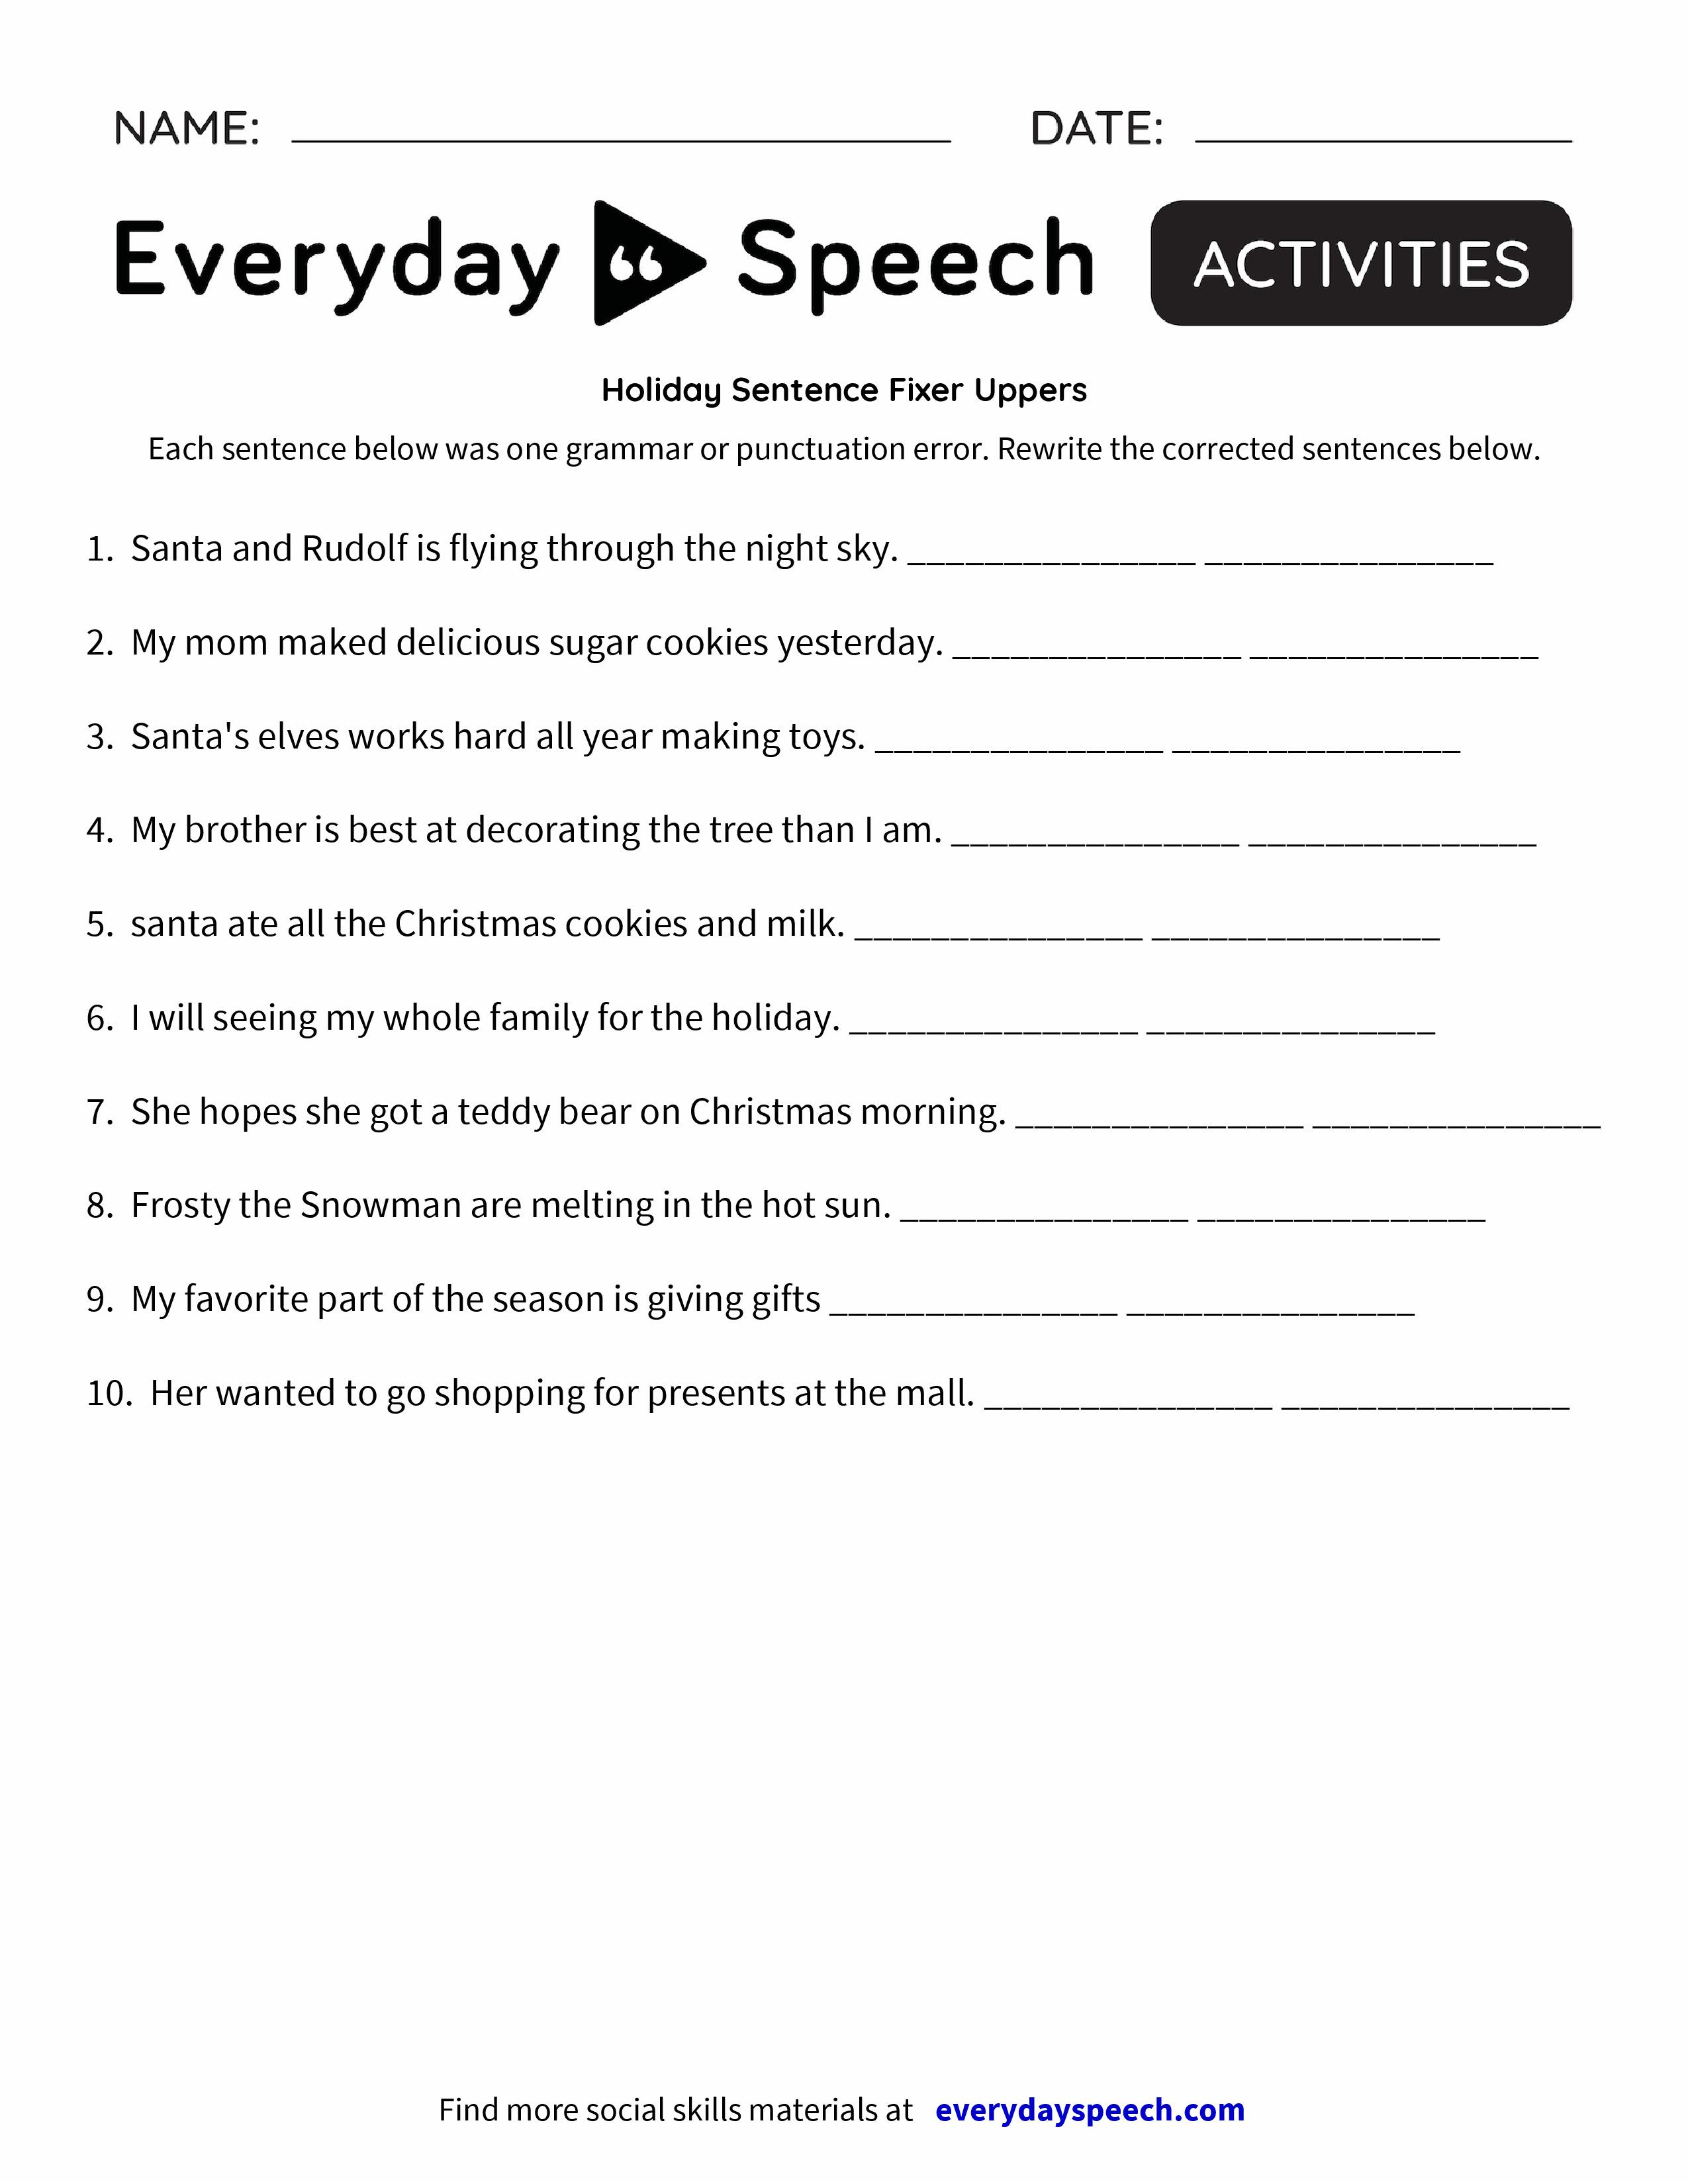 worksheet Part Of Speech Worksheet holiday sentence fixer uppers everyday speech preview